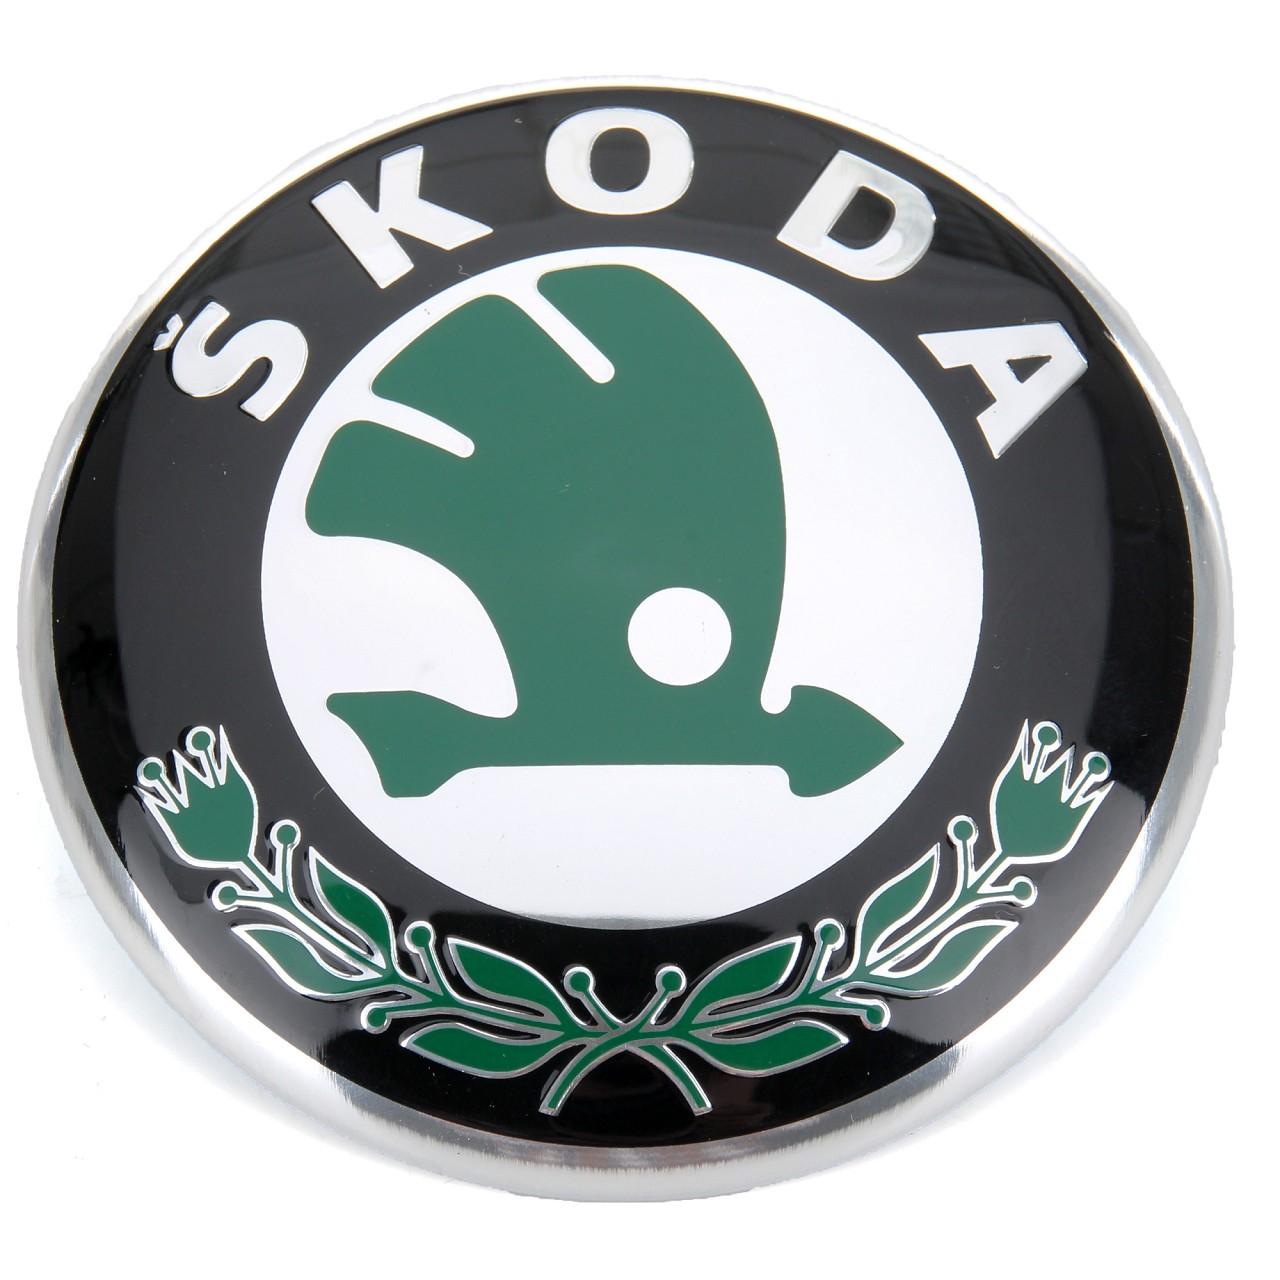 ORIGINAL Skoda Emblem Plakette Logo Wappen Fabia Octavia Roomster 1U0853621C MEL